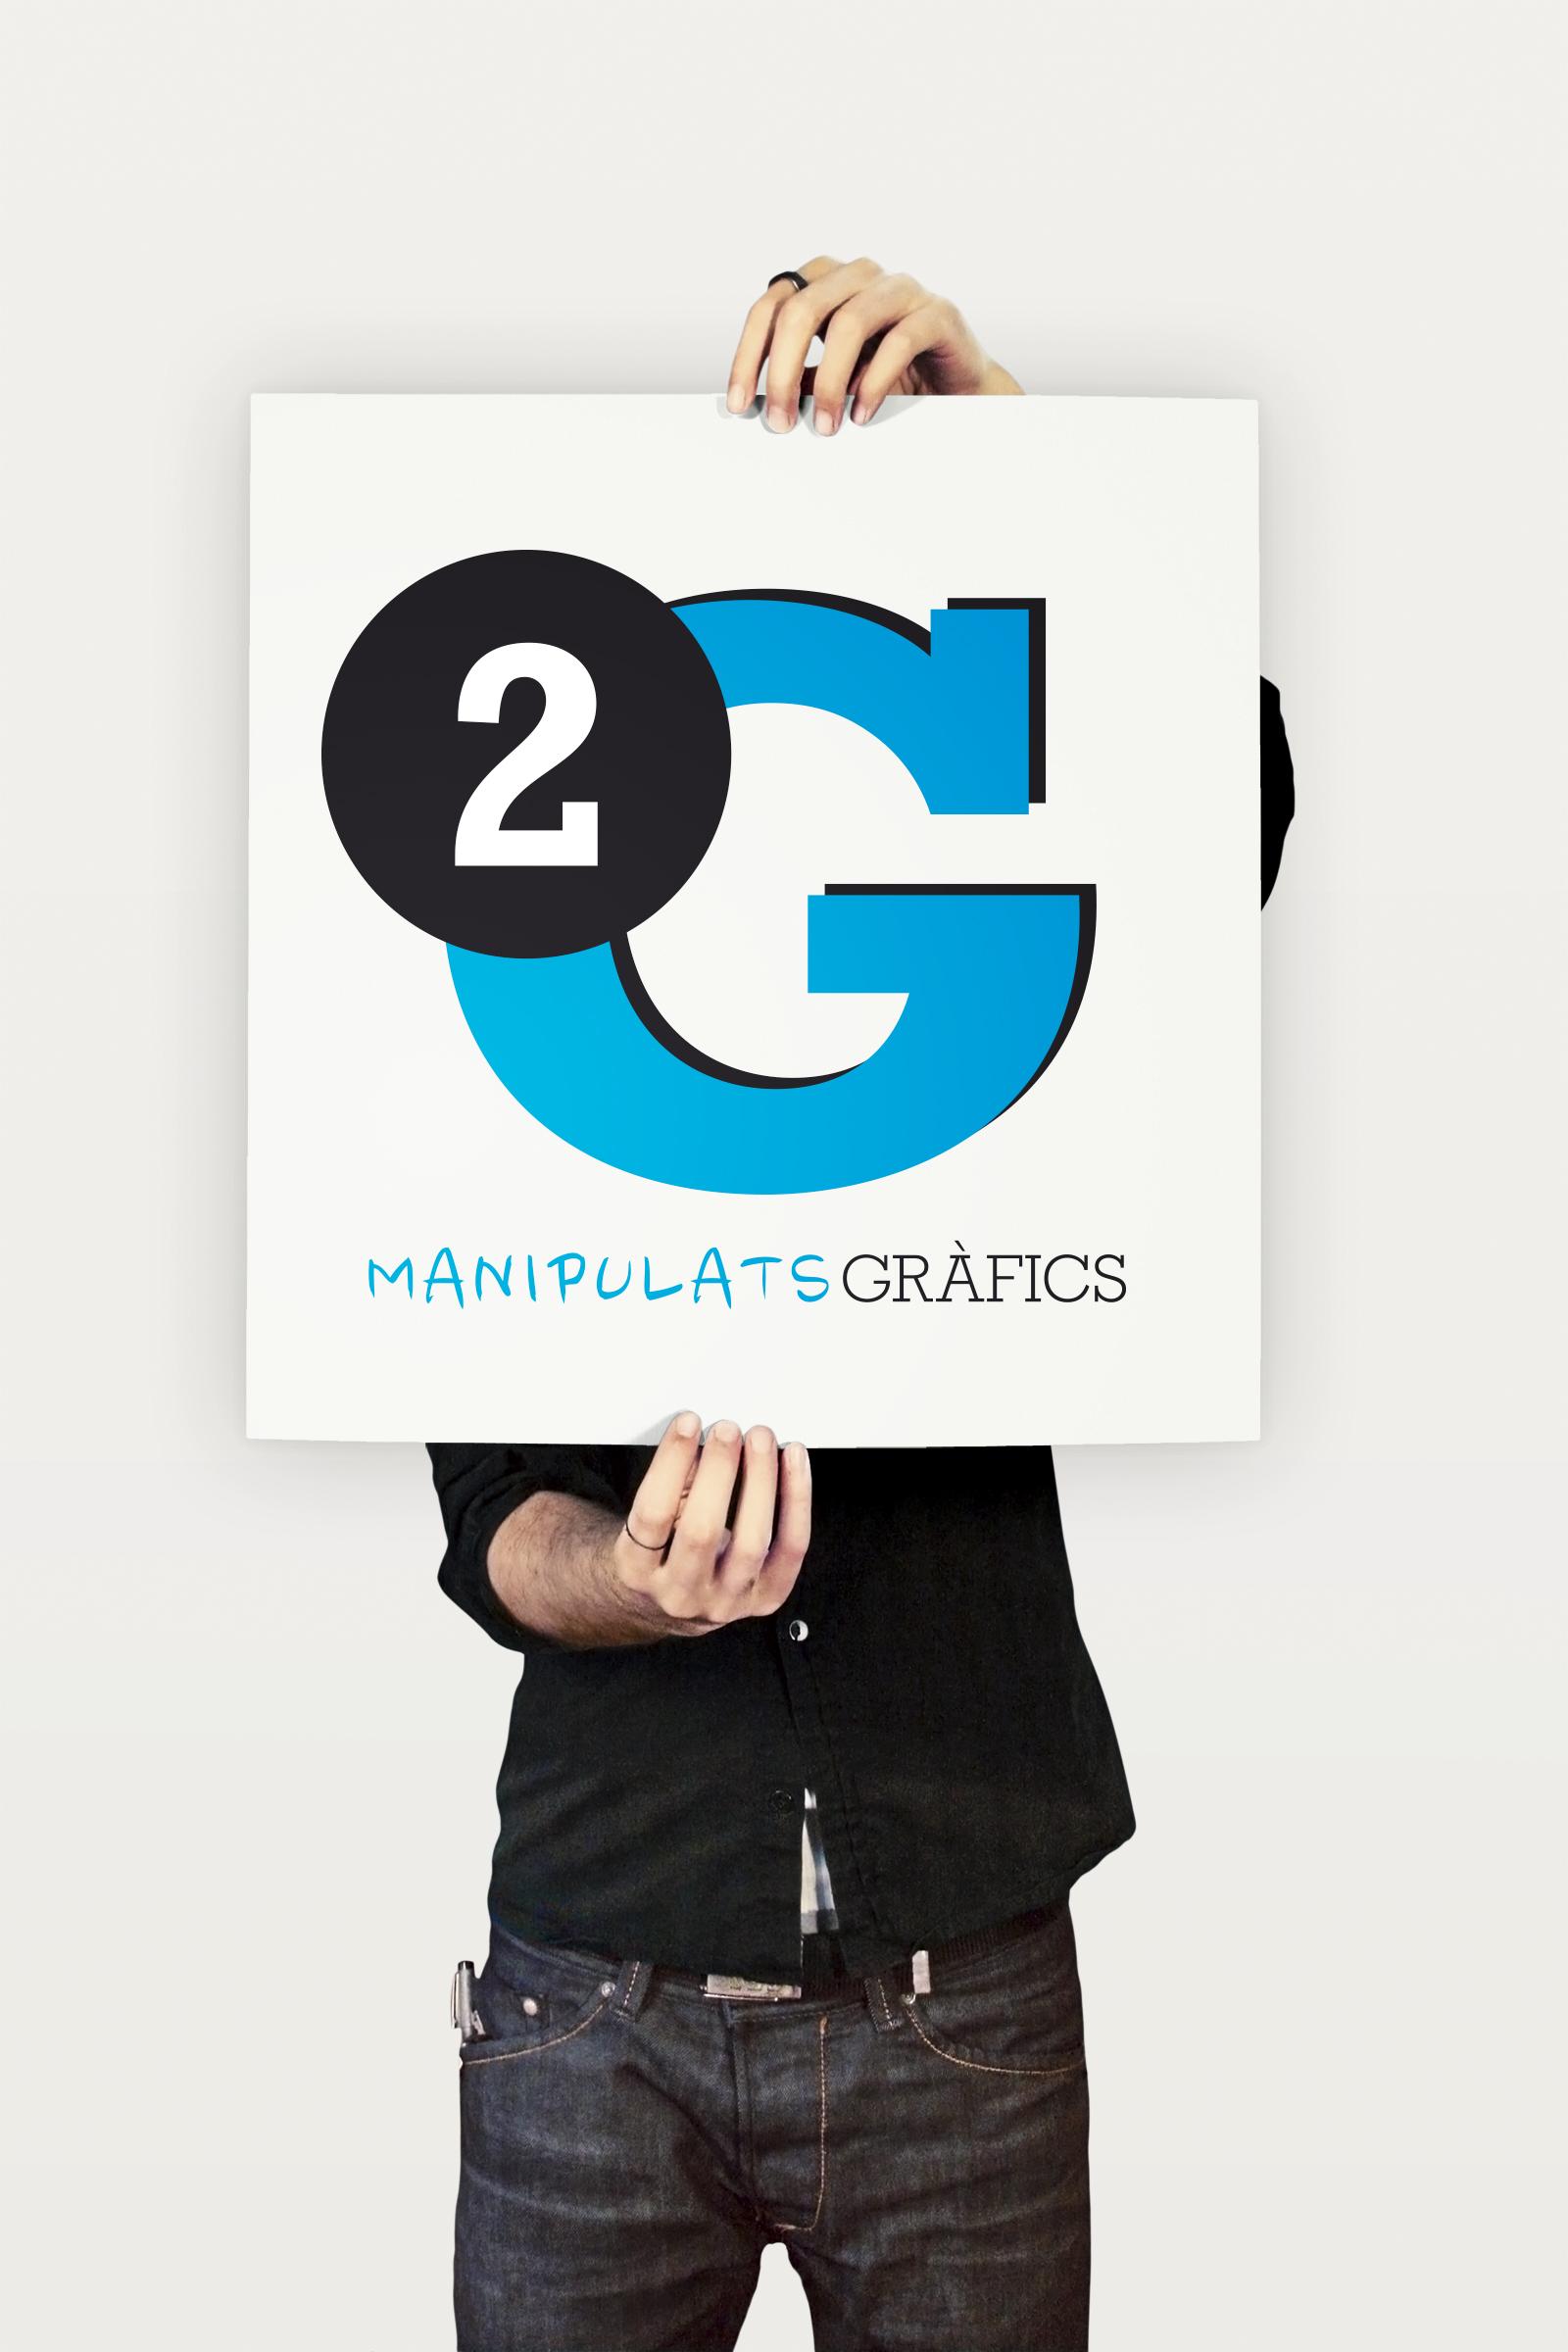 2G Manipulats Gràfics